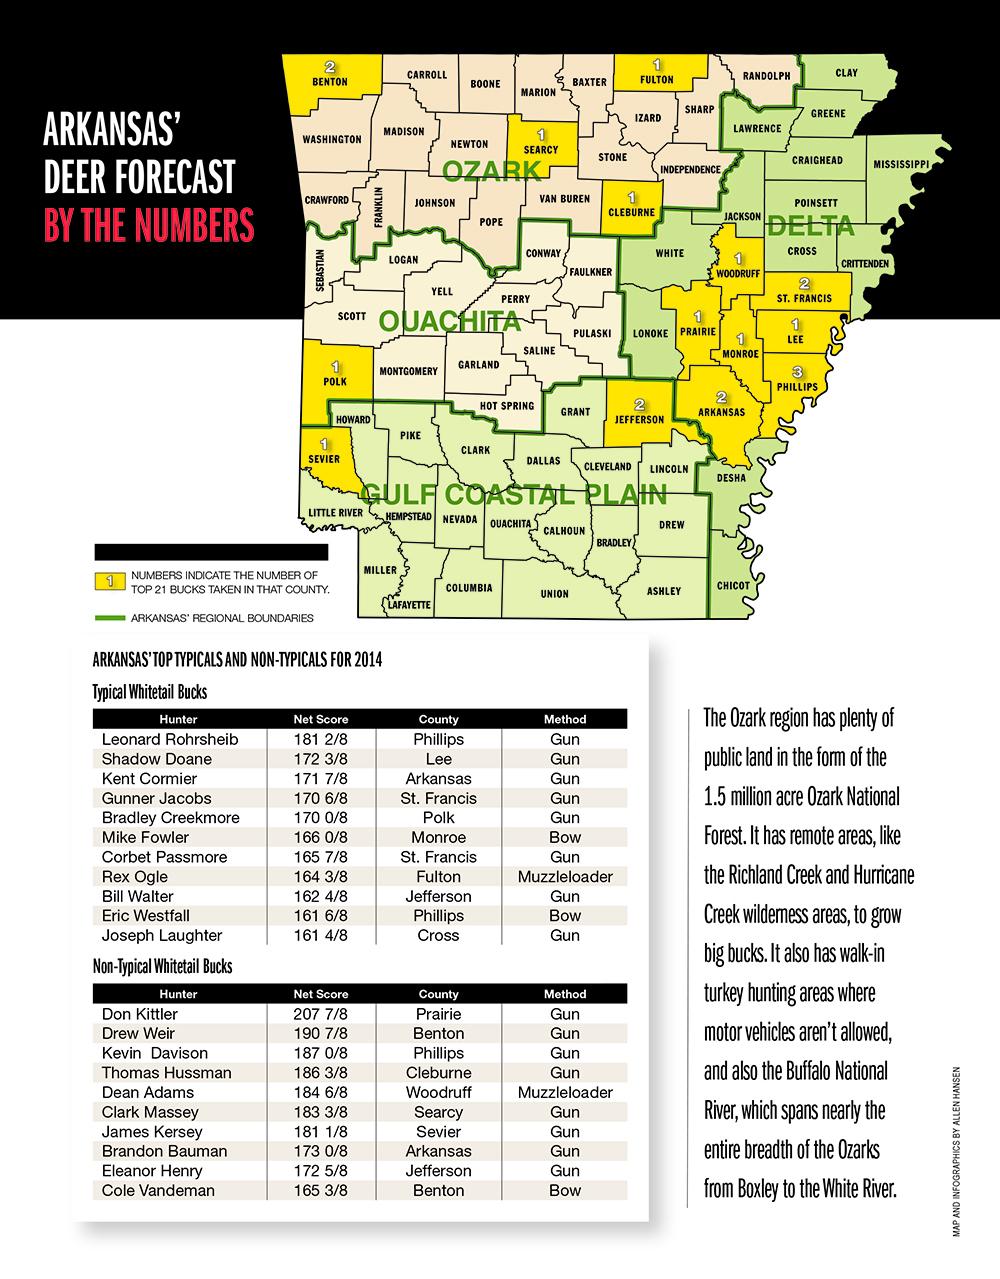 2015 Trophy Deer Forecast: Arkansas